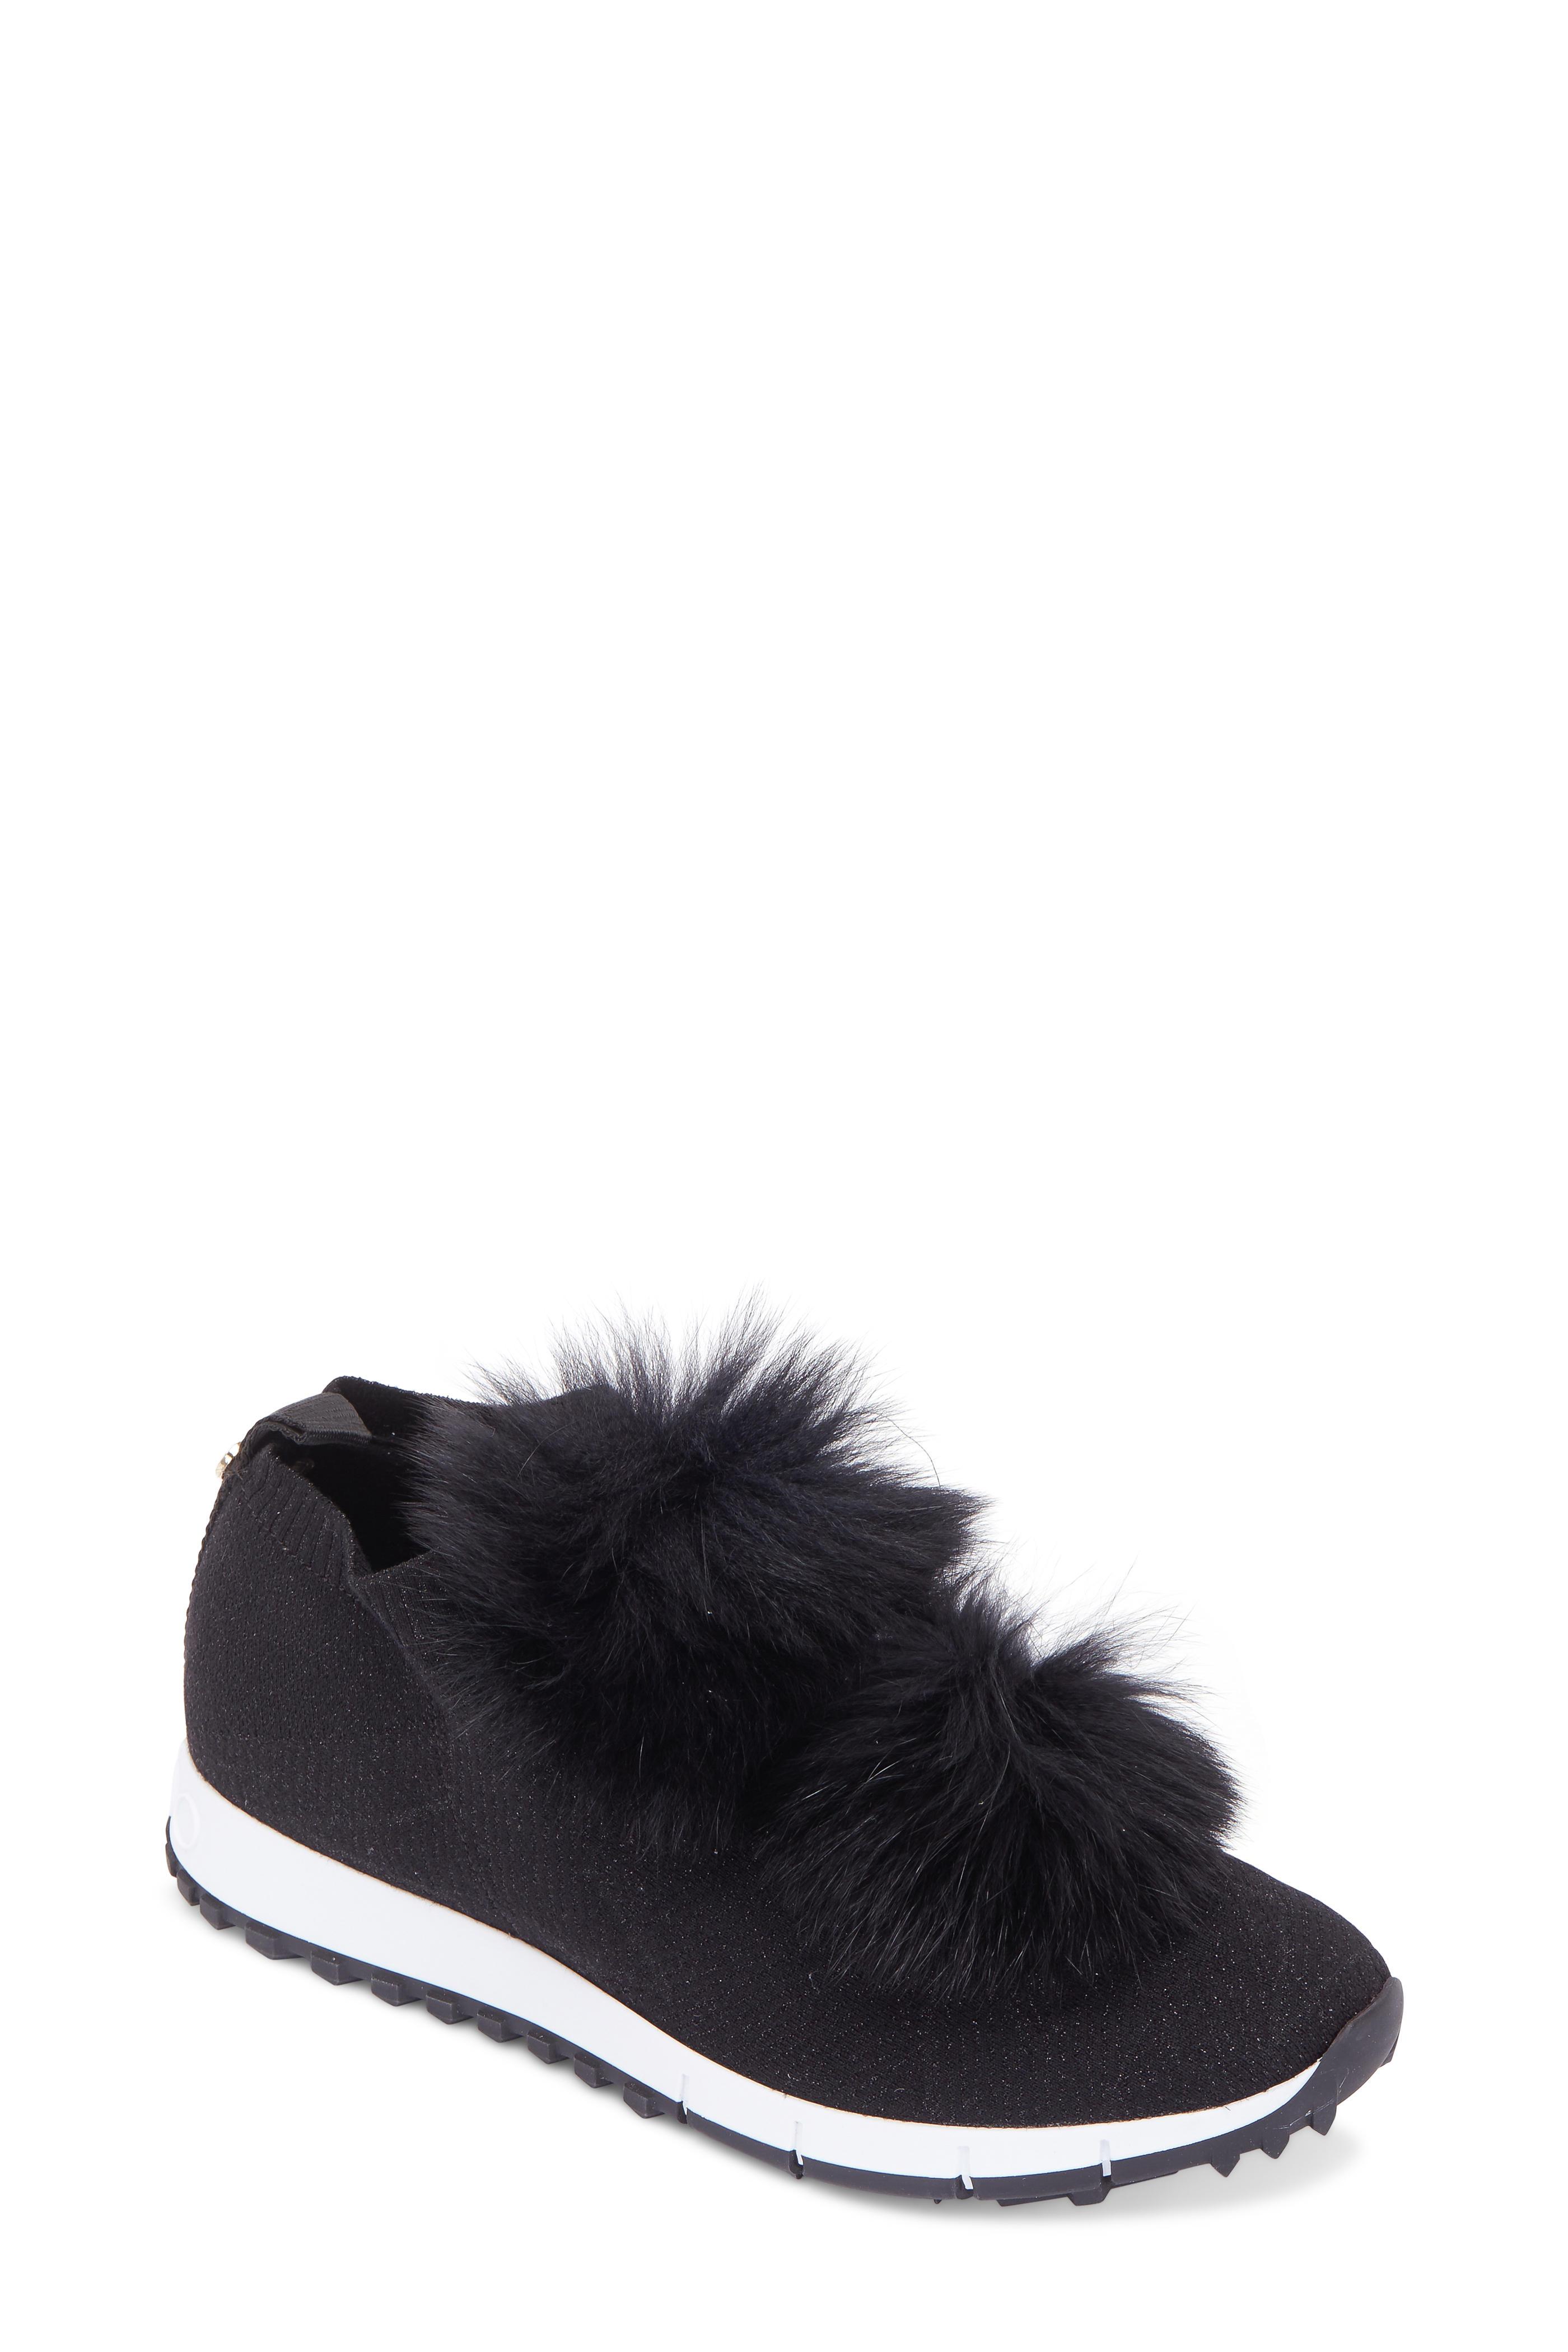 472a20d898bf Jimmy Choo - Norway Black Knit   Fur Pom-Pom Sneaker